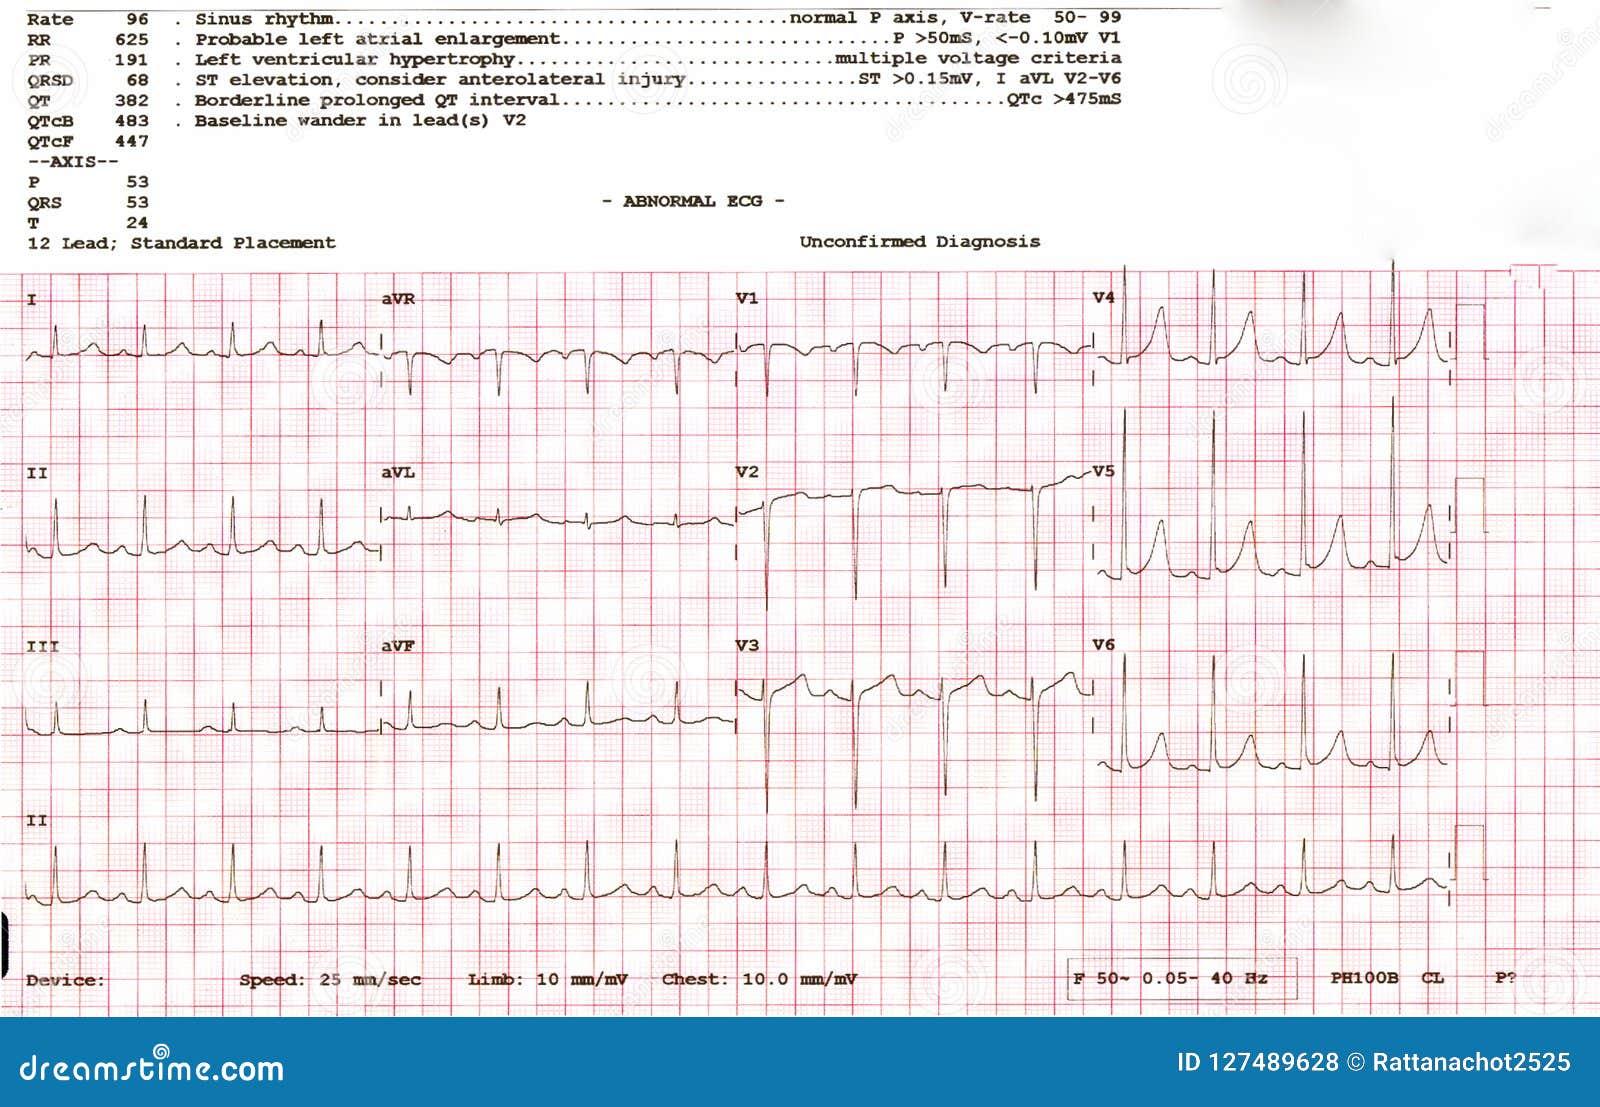 Cardiogram Waveform From An EKG Showing Abnormal EKG Test A